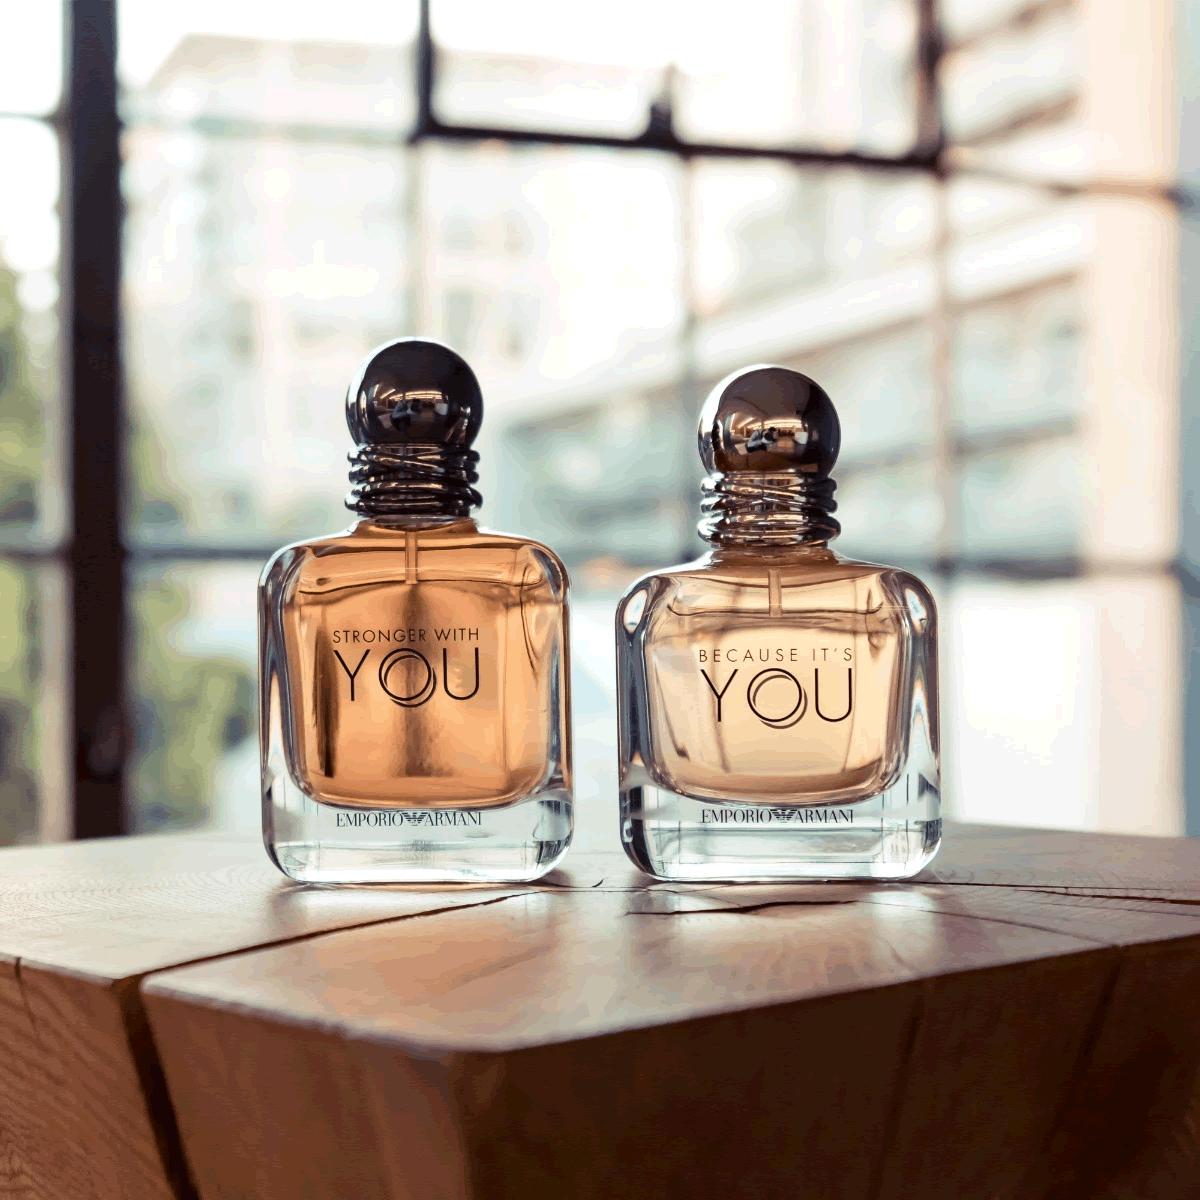 Emporio Armani Fragrance Duo